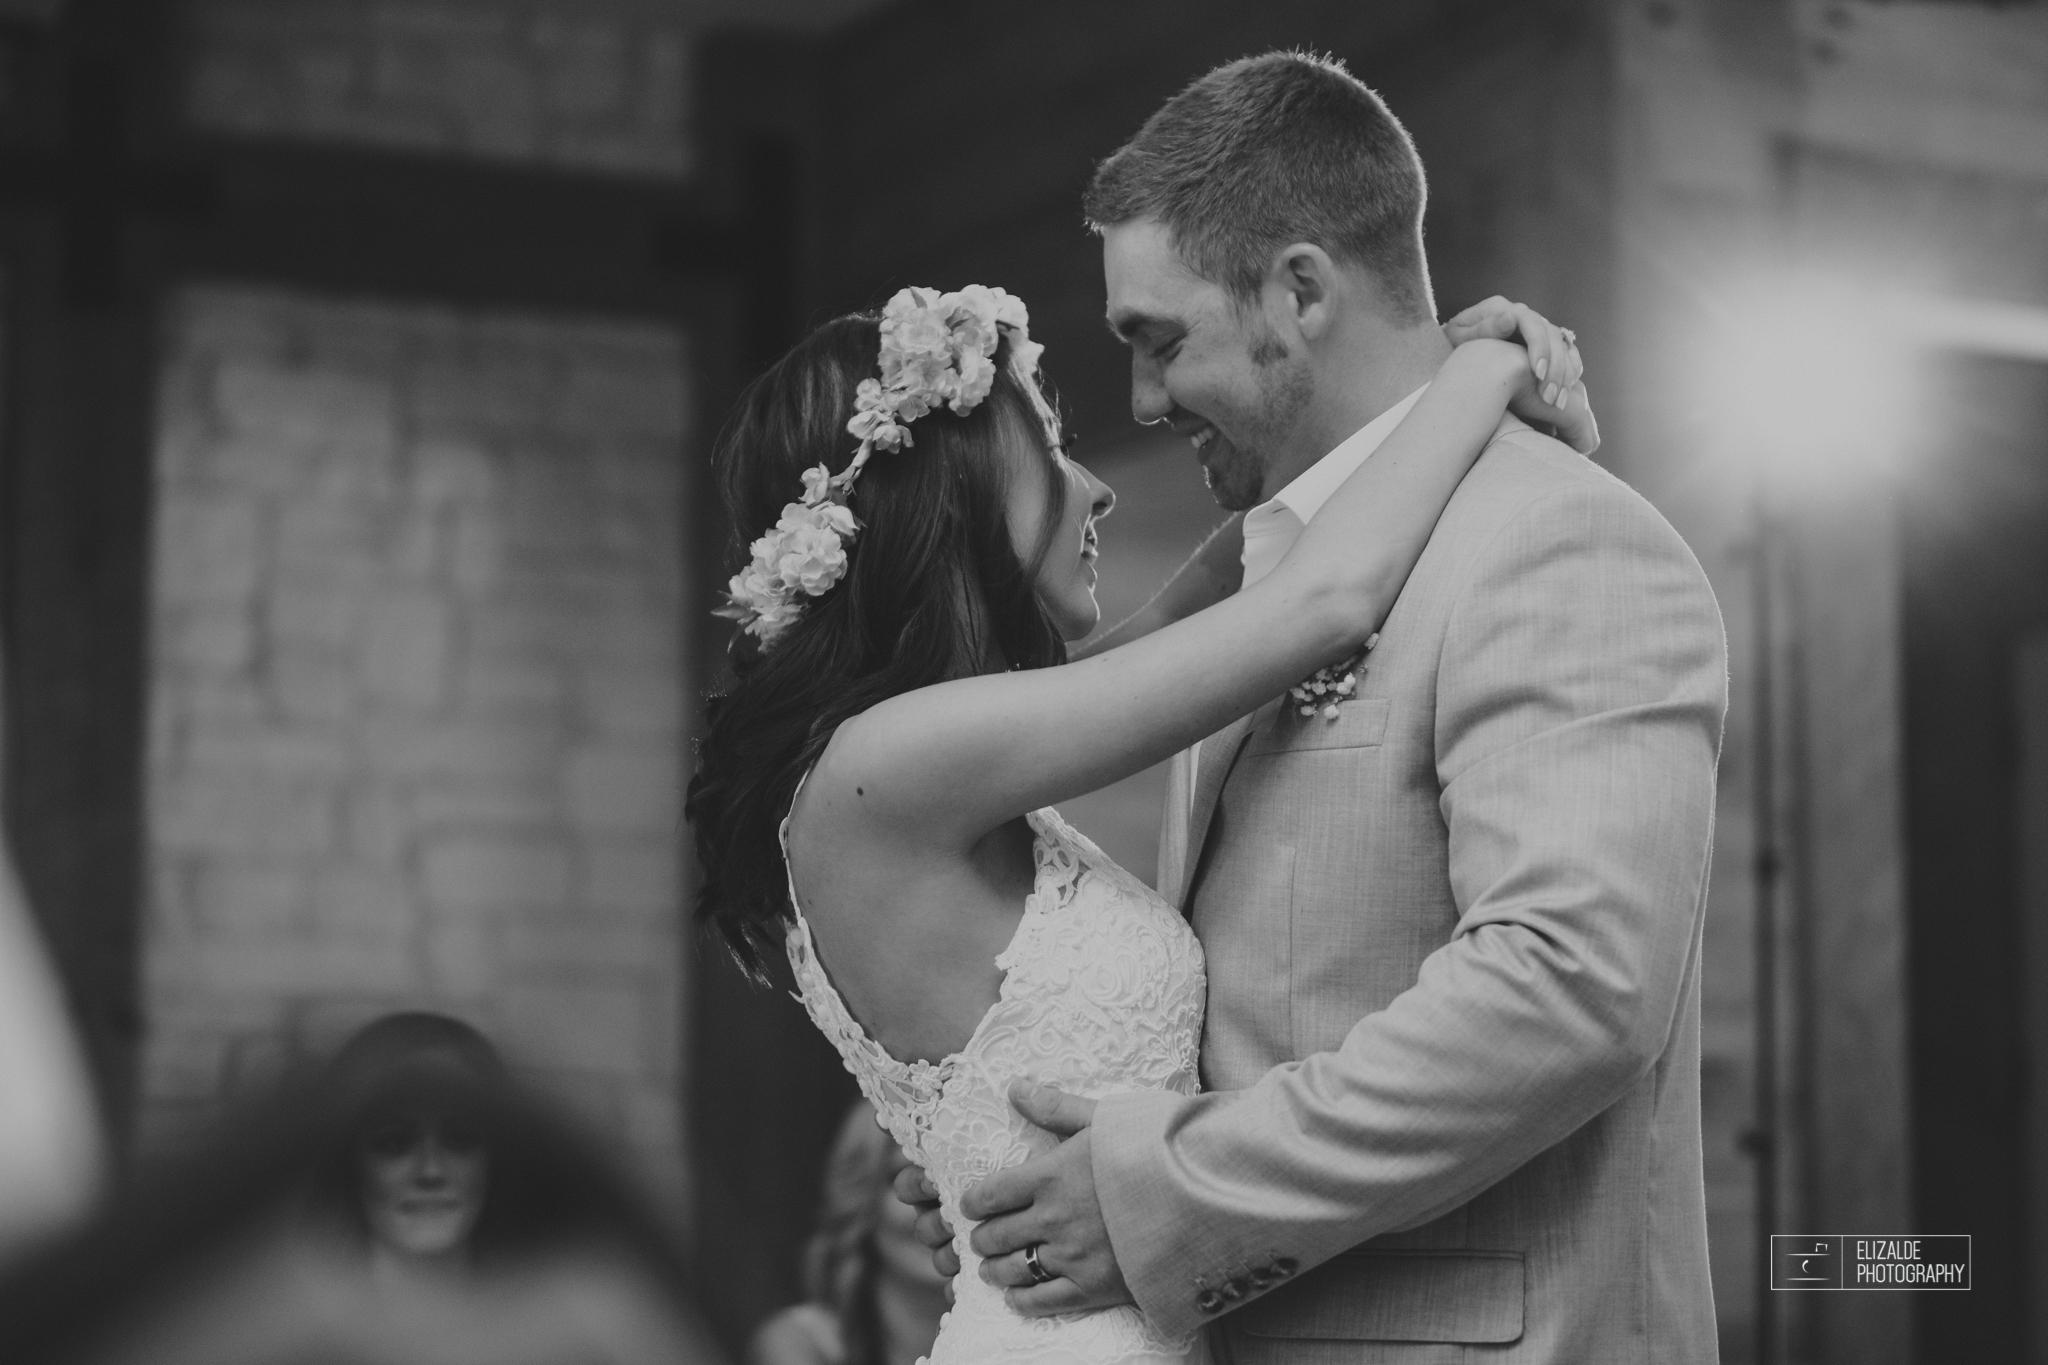 Wedding photographer Dallas_Elizalde Photography_DFW Wedding photographer_ Hickoty Hills_Wedding Photography (58 of 90).jpg